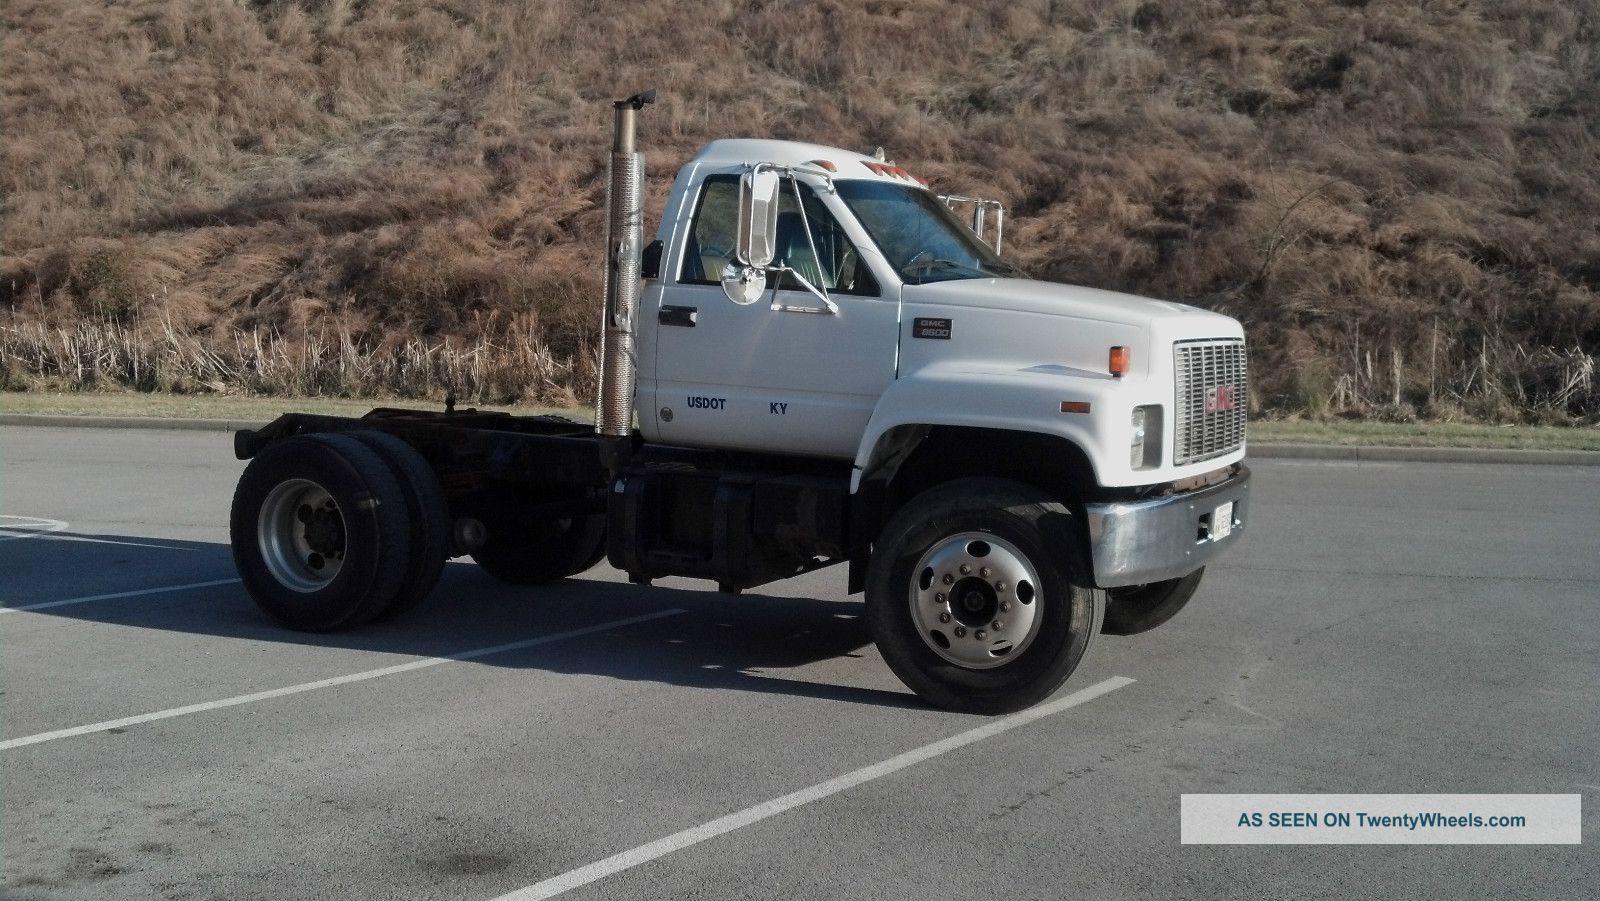 2000 gmc c8500 GMC Semi Truck